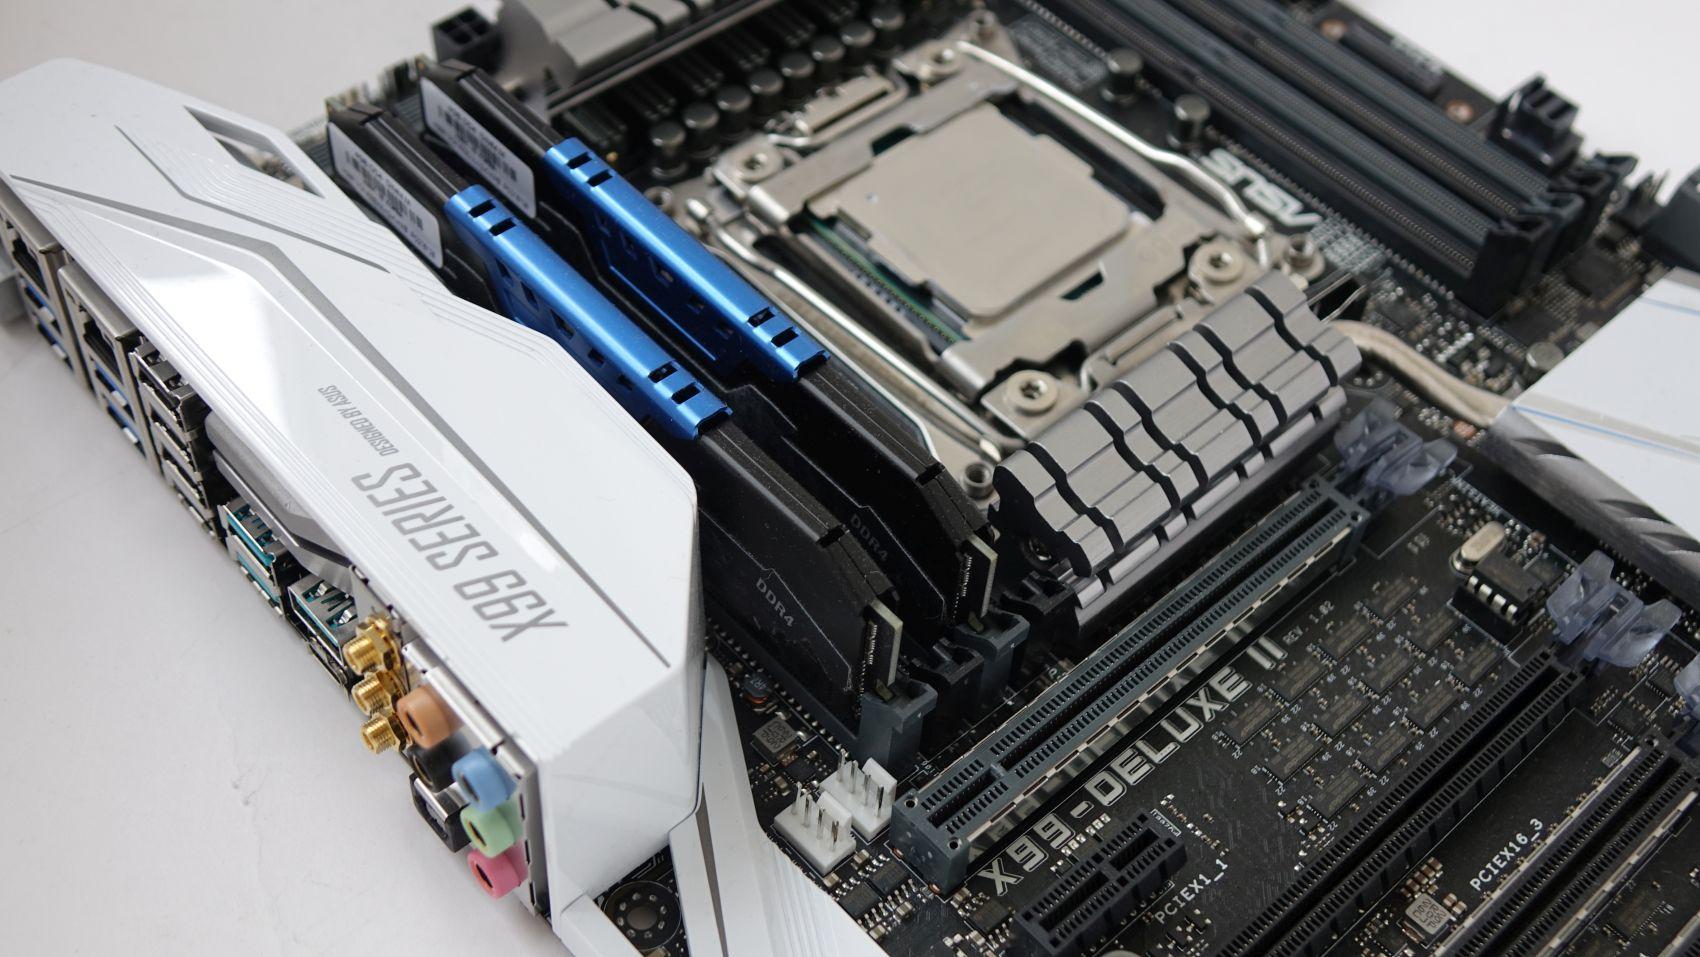 Intel Xeon E5-2620 v4 on asus x99